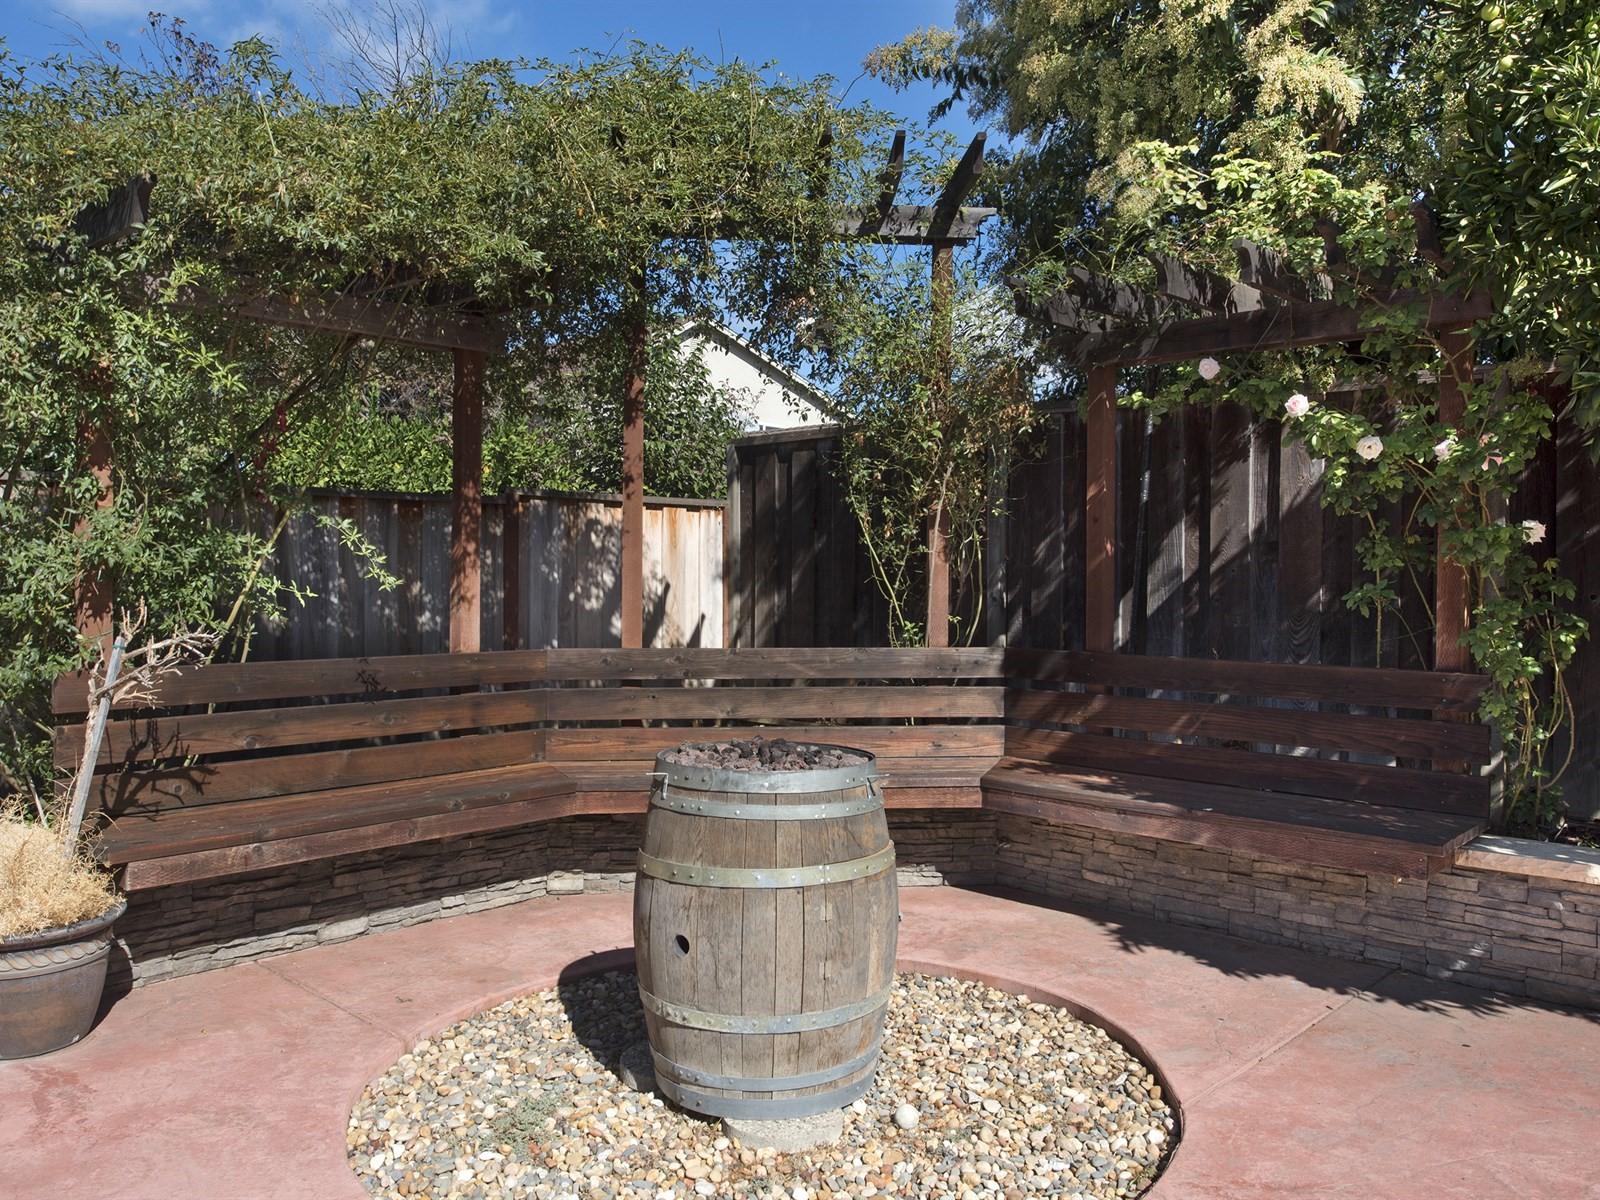 Backyard Arbor & Firepit